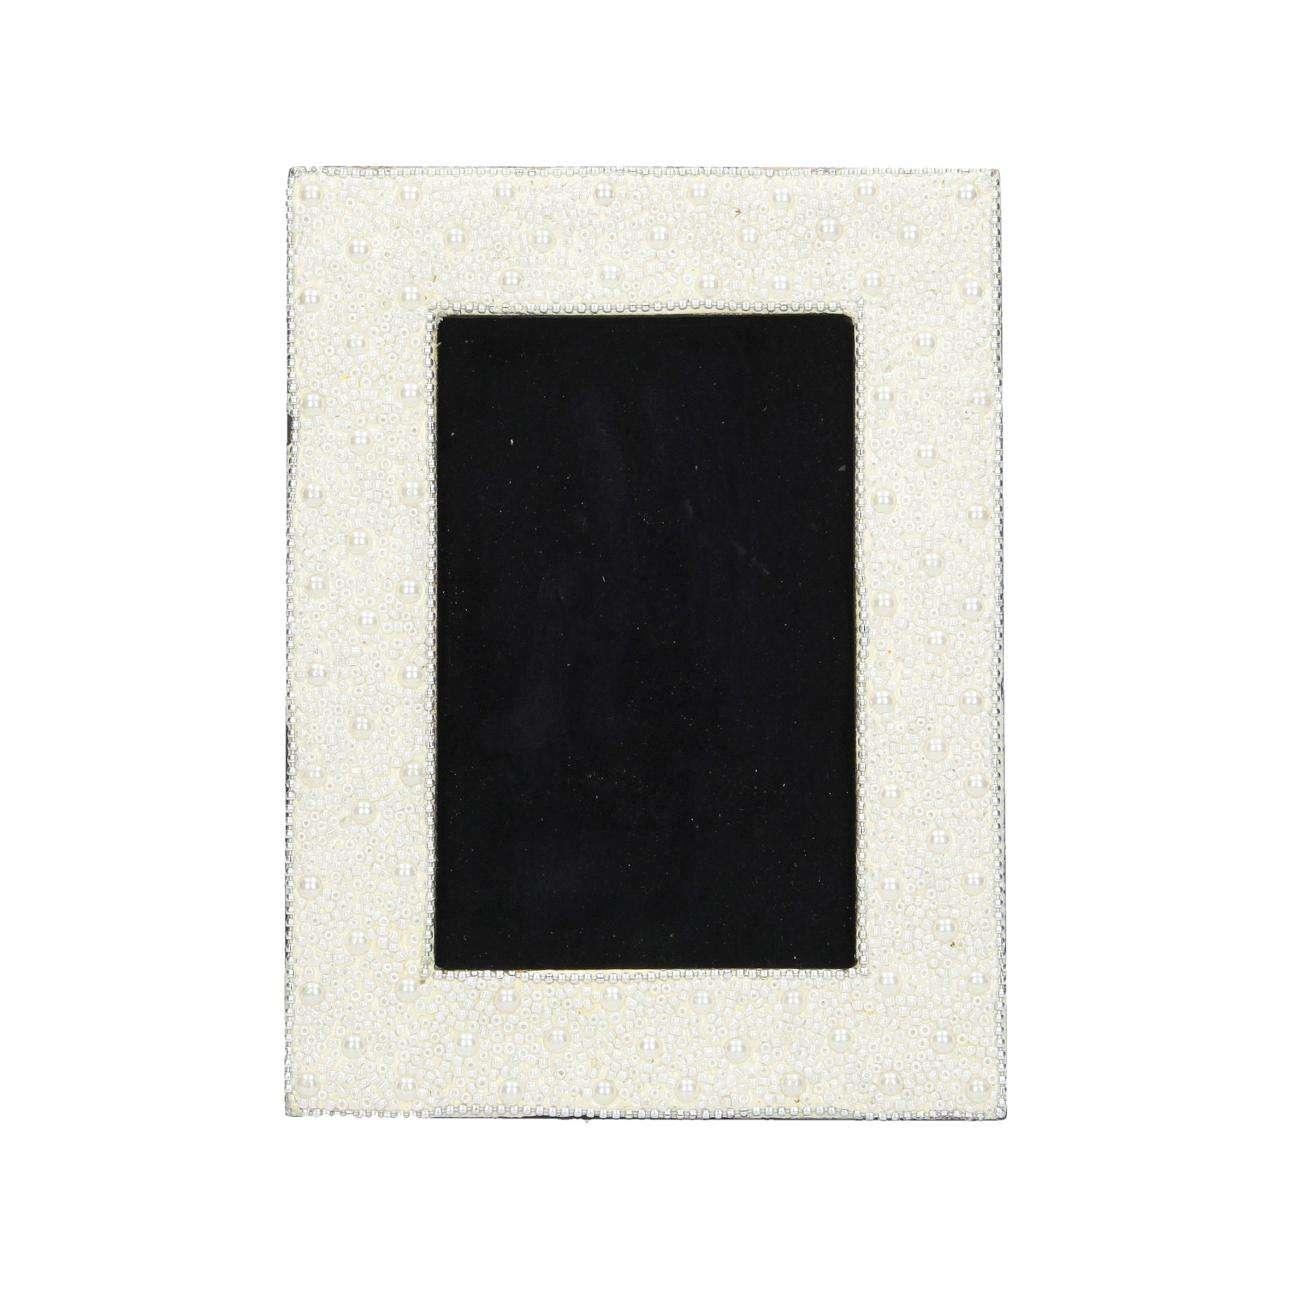 Fotorahmen Carina 15,5x1,5x20,5cm, 15,5 × 1,5 × 20,5 cm | Dekoration > Bilder und Rahmen > Rahmen | Cremeweiß | Mdf | Dekoria